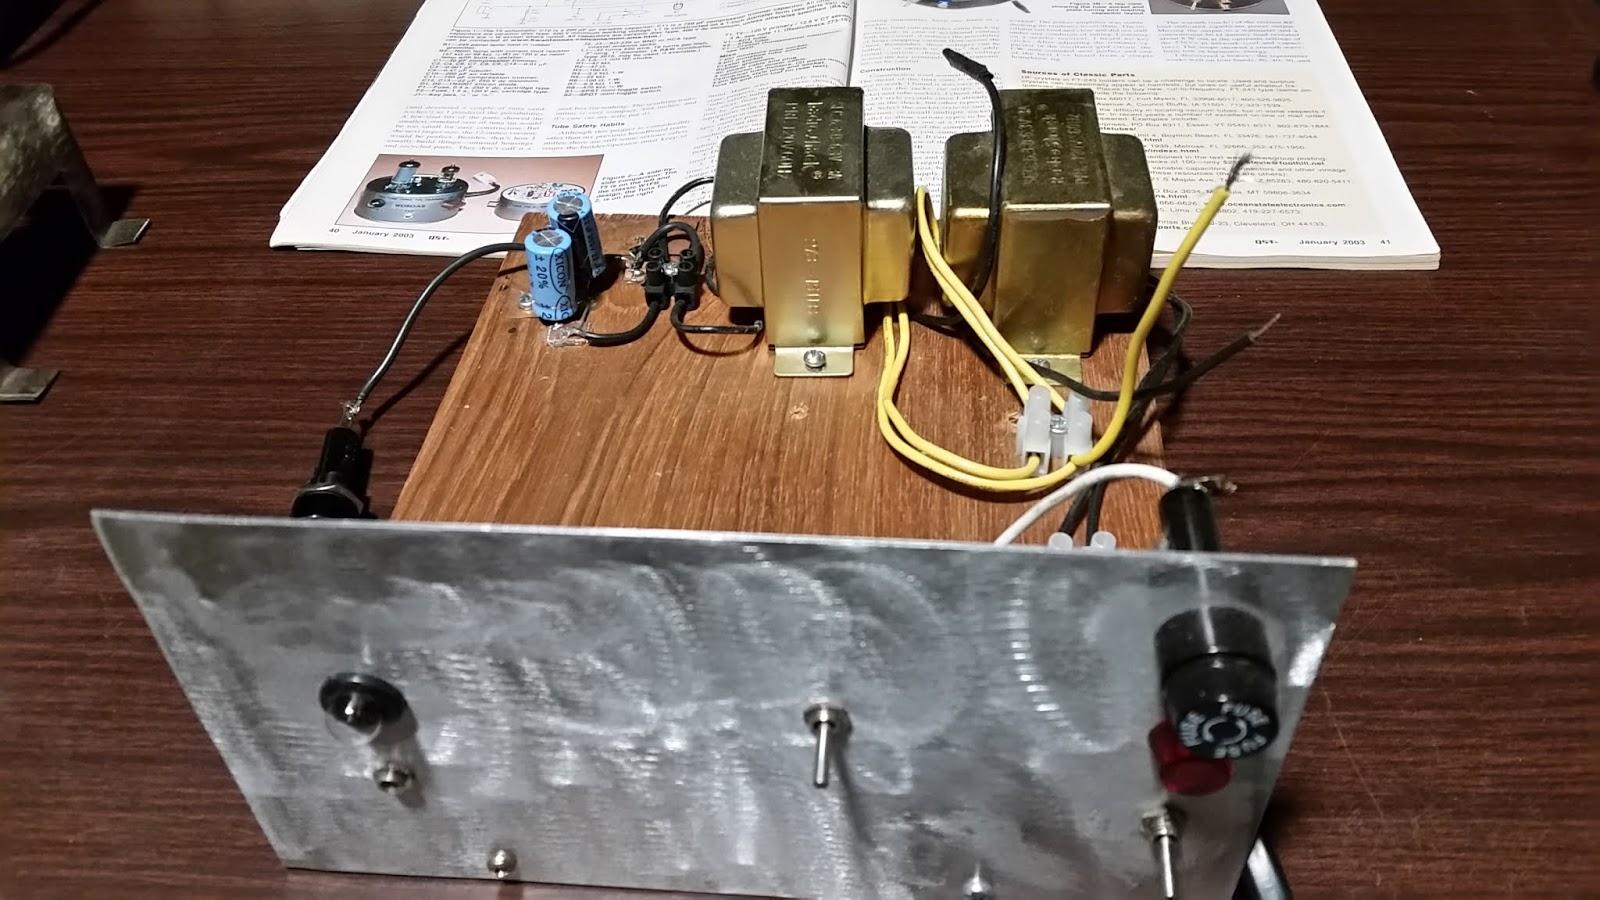 Ham Radio Blogspot: The Two Tuber 8 watt Transmitter